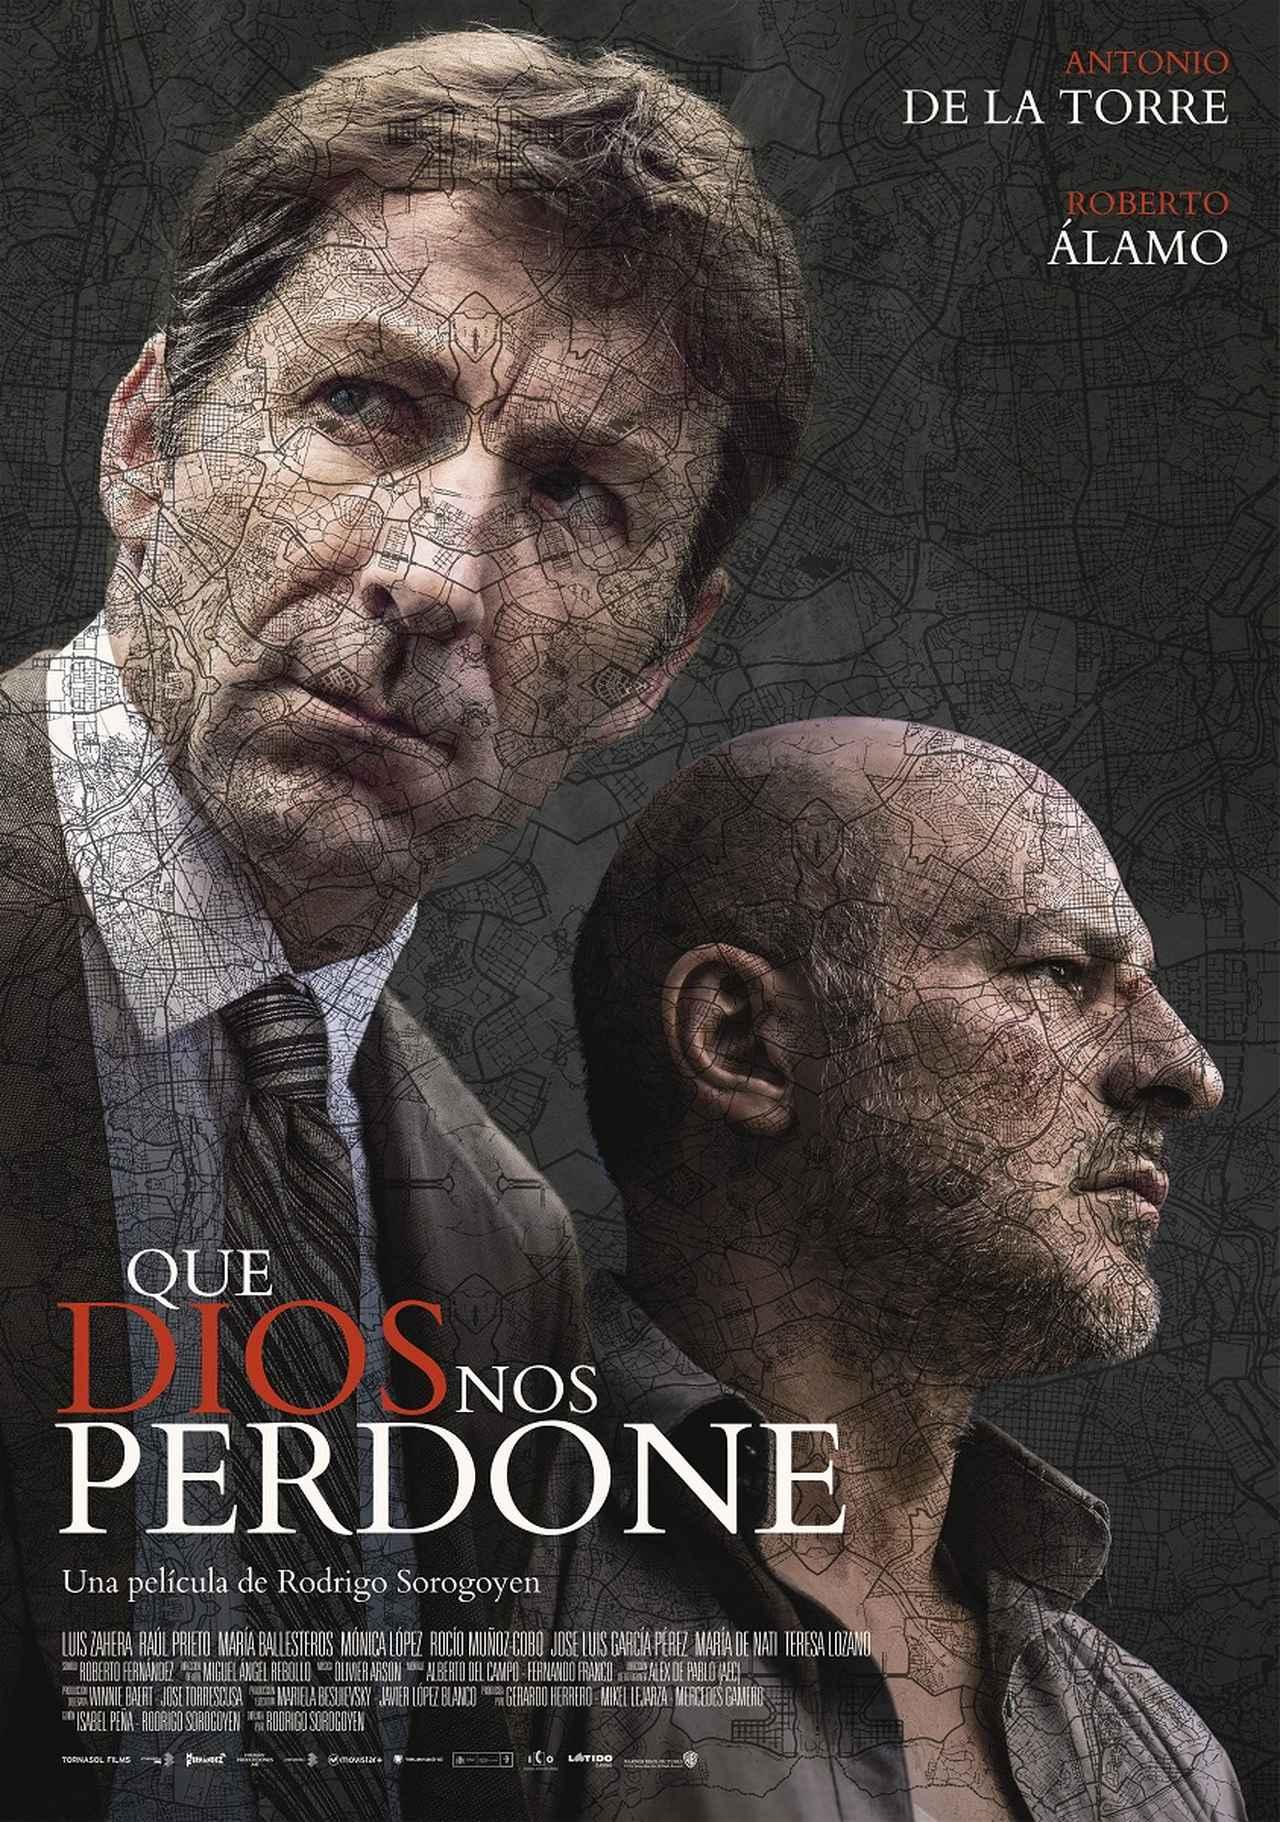 画像1: ©2015 TORNASOL FILMS, S.A. – ATRESMEDIA CINE, S.L. – HERNANDEZ & FERNANDEZ PC, S.L. – MISTERY PRODUCCIONES A.I.E